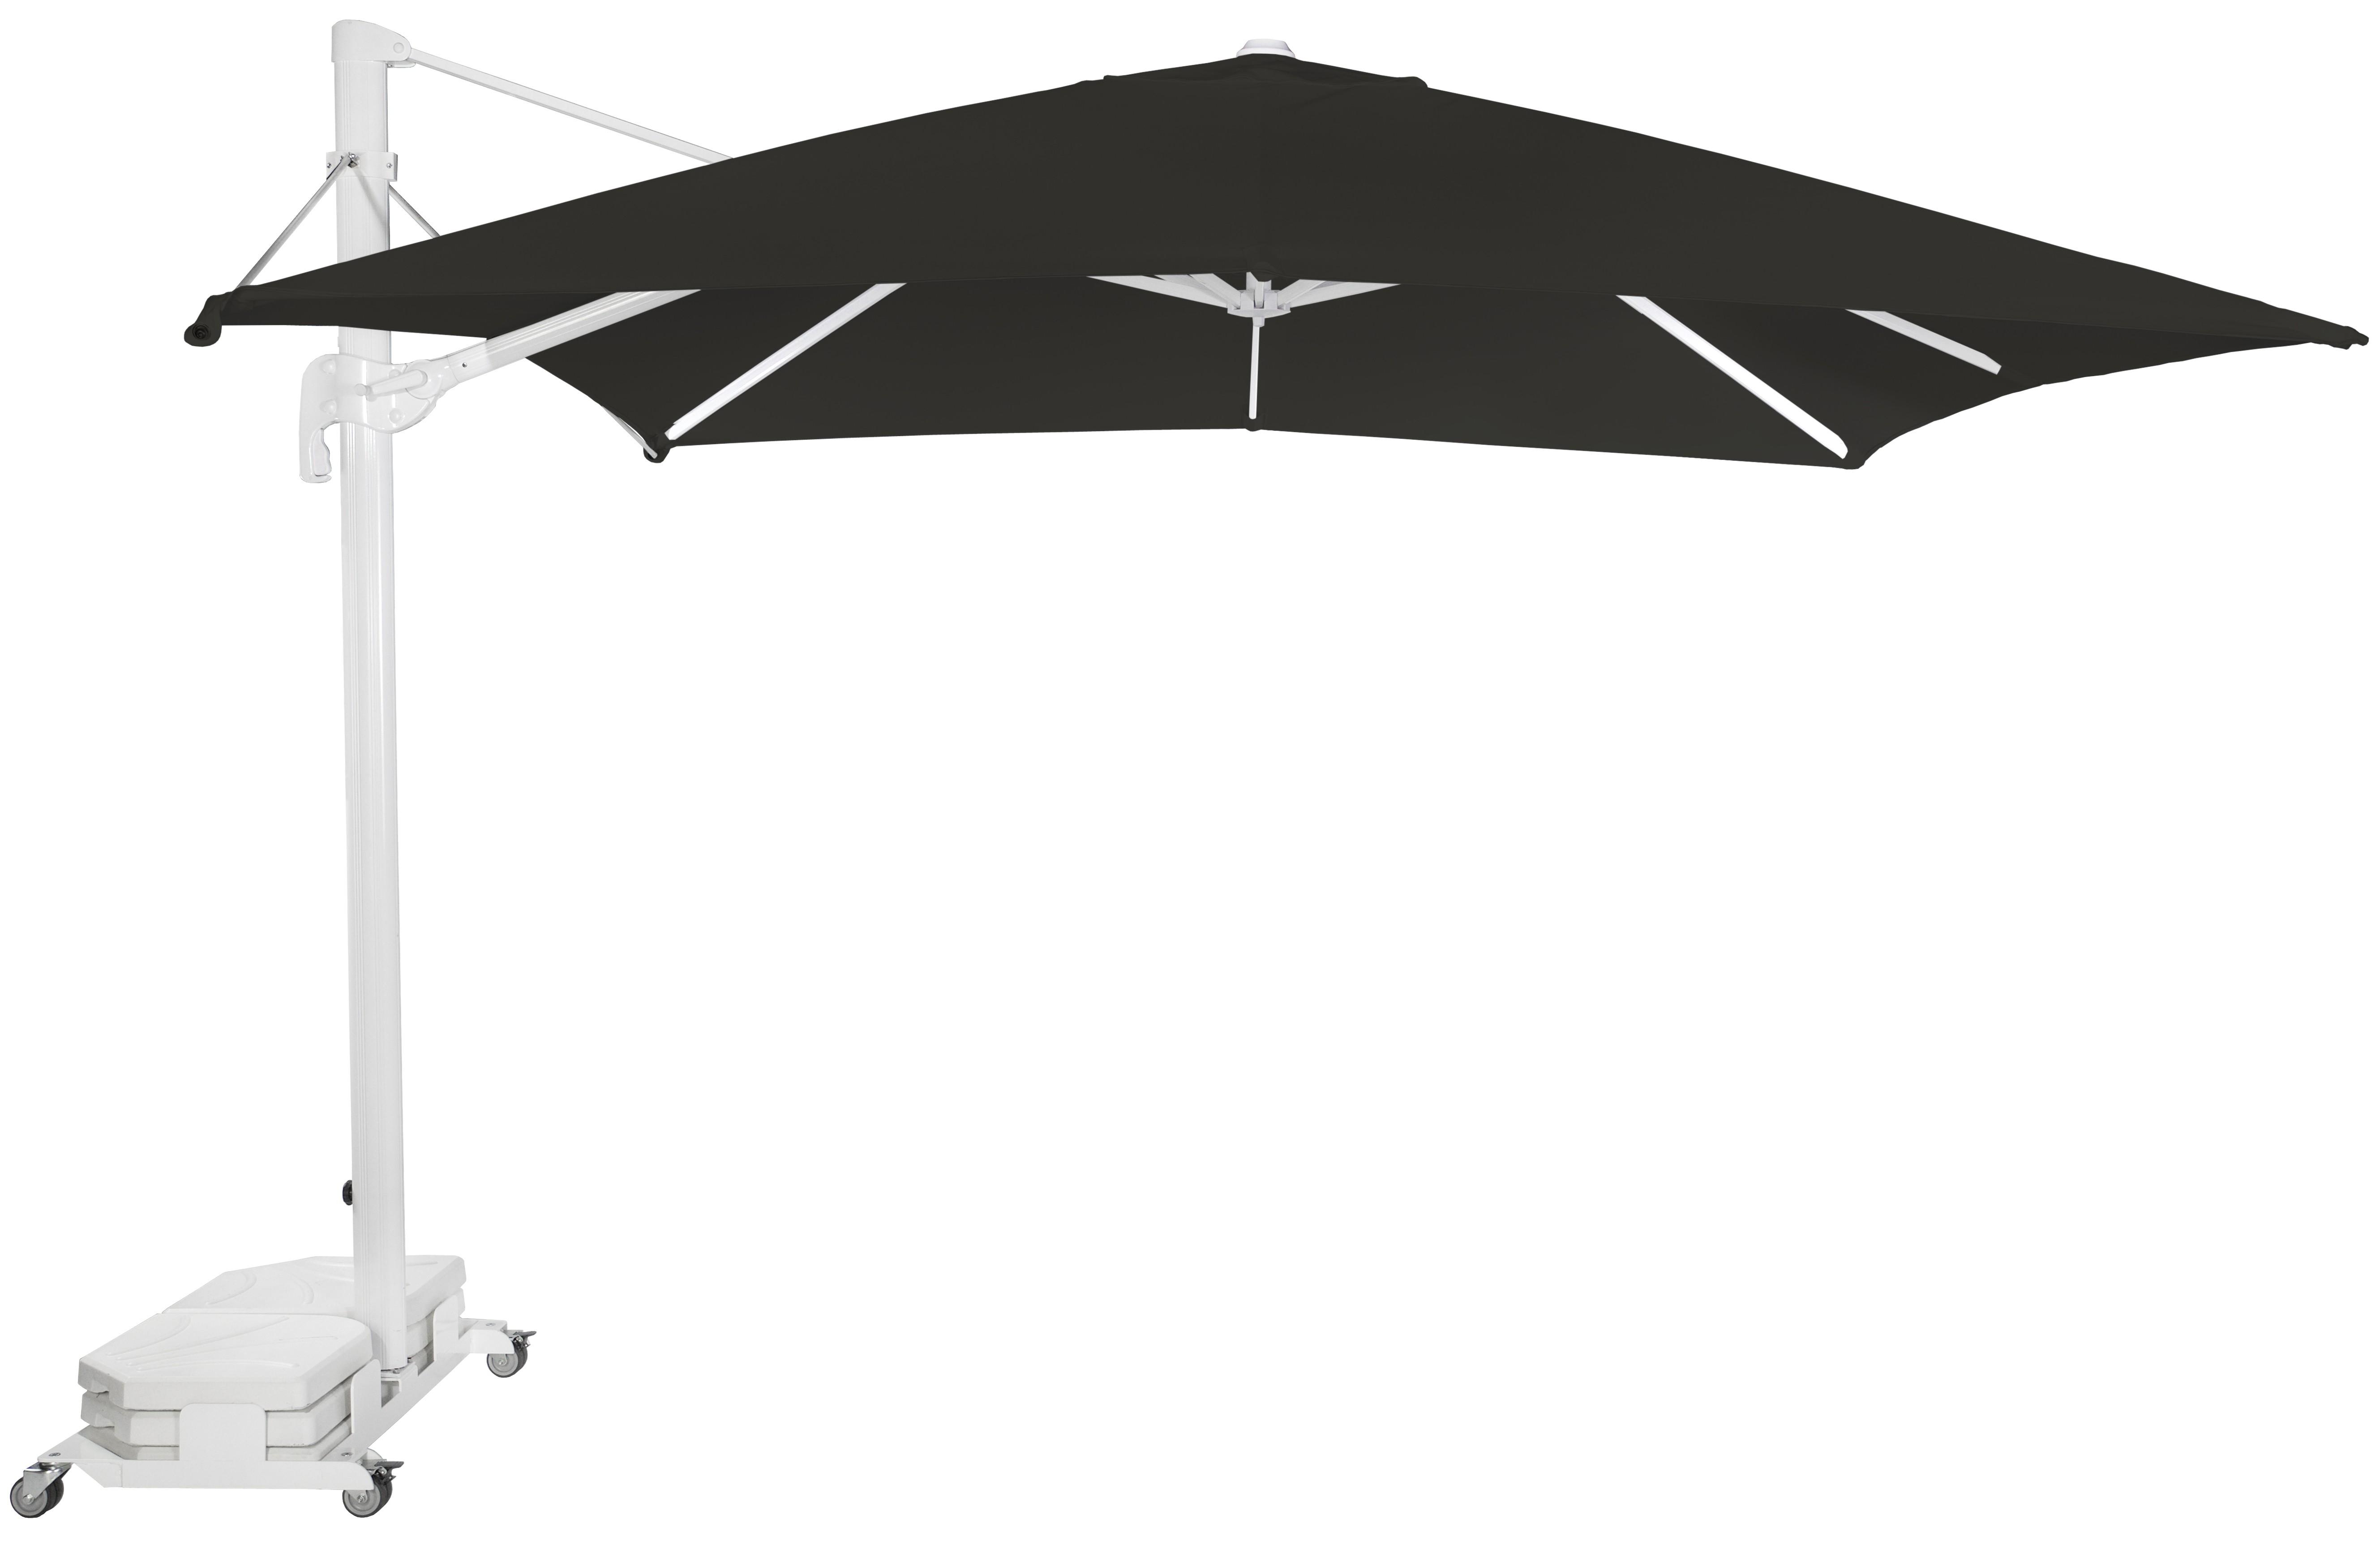 Parasol Ezpeleta Cuadrados White 2 Blancos black Olefin 3X3